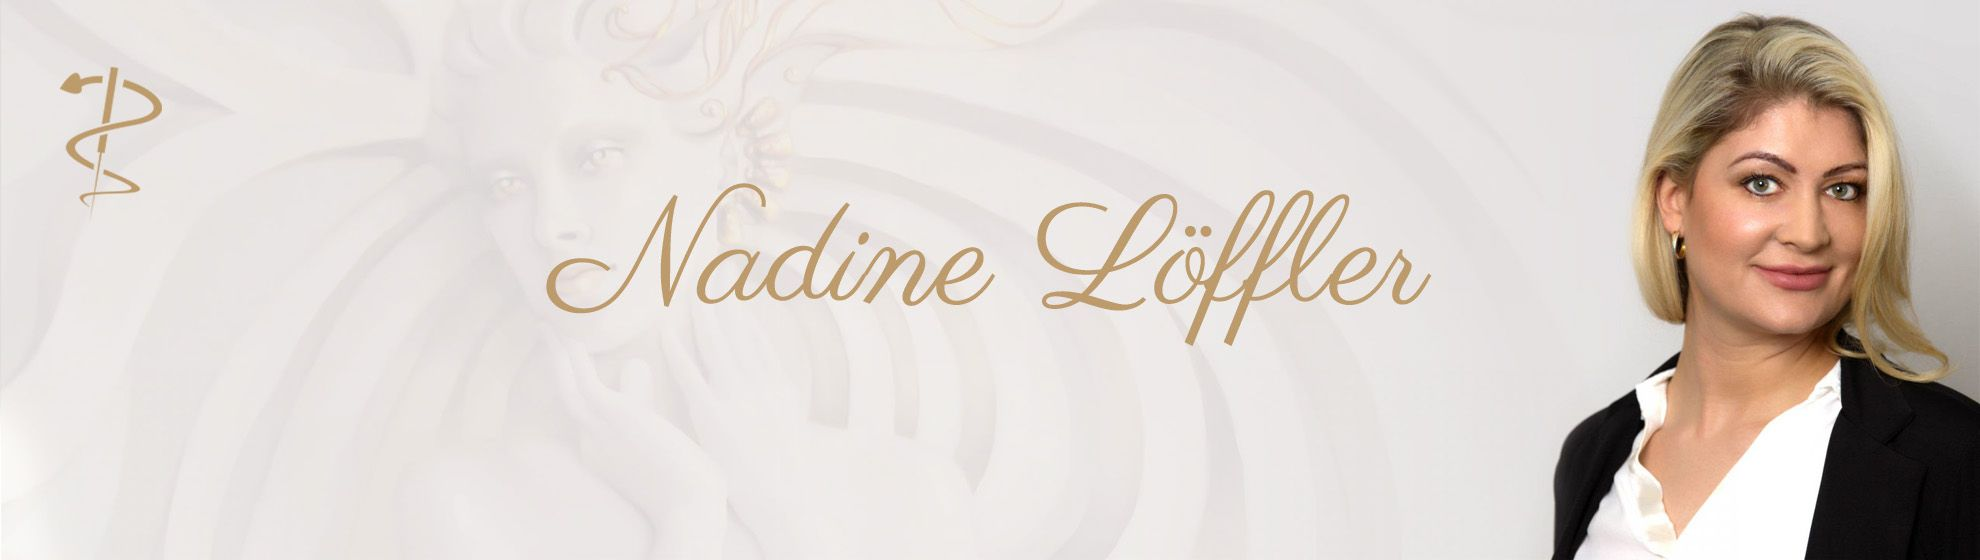 Nadine Löffler